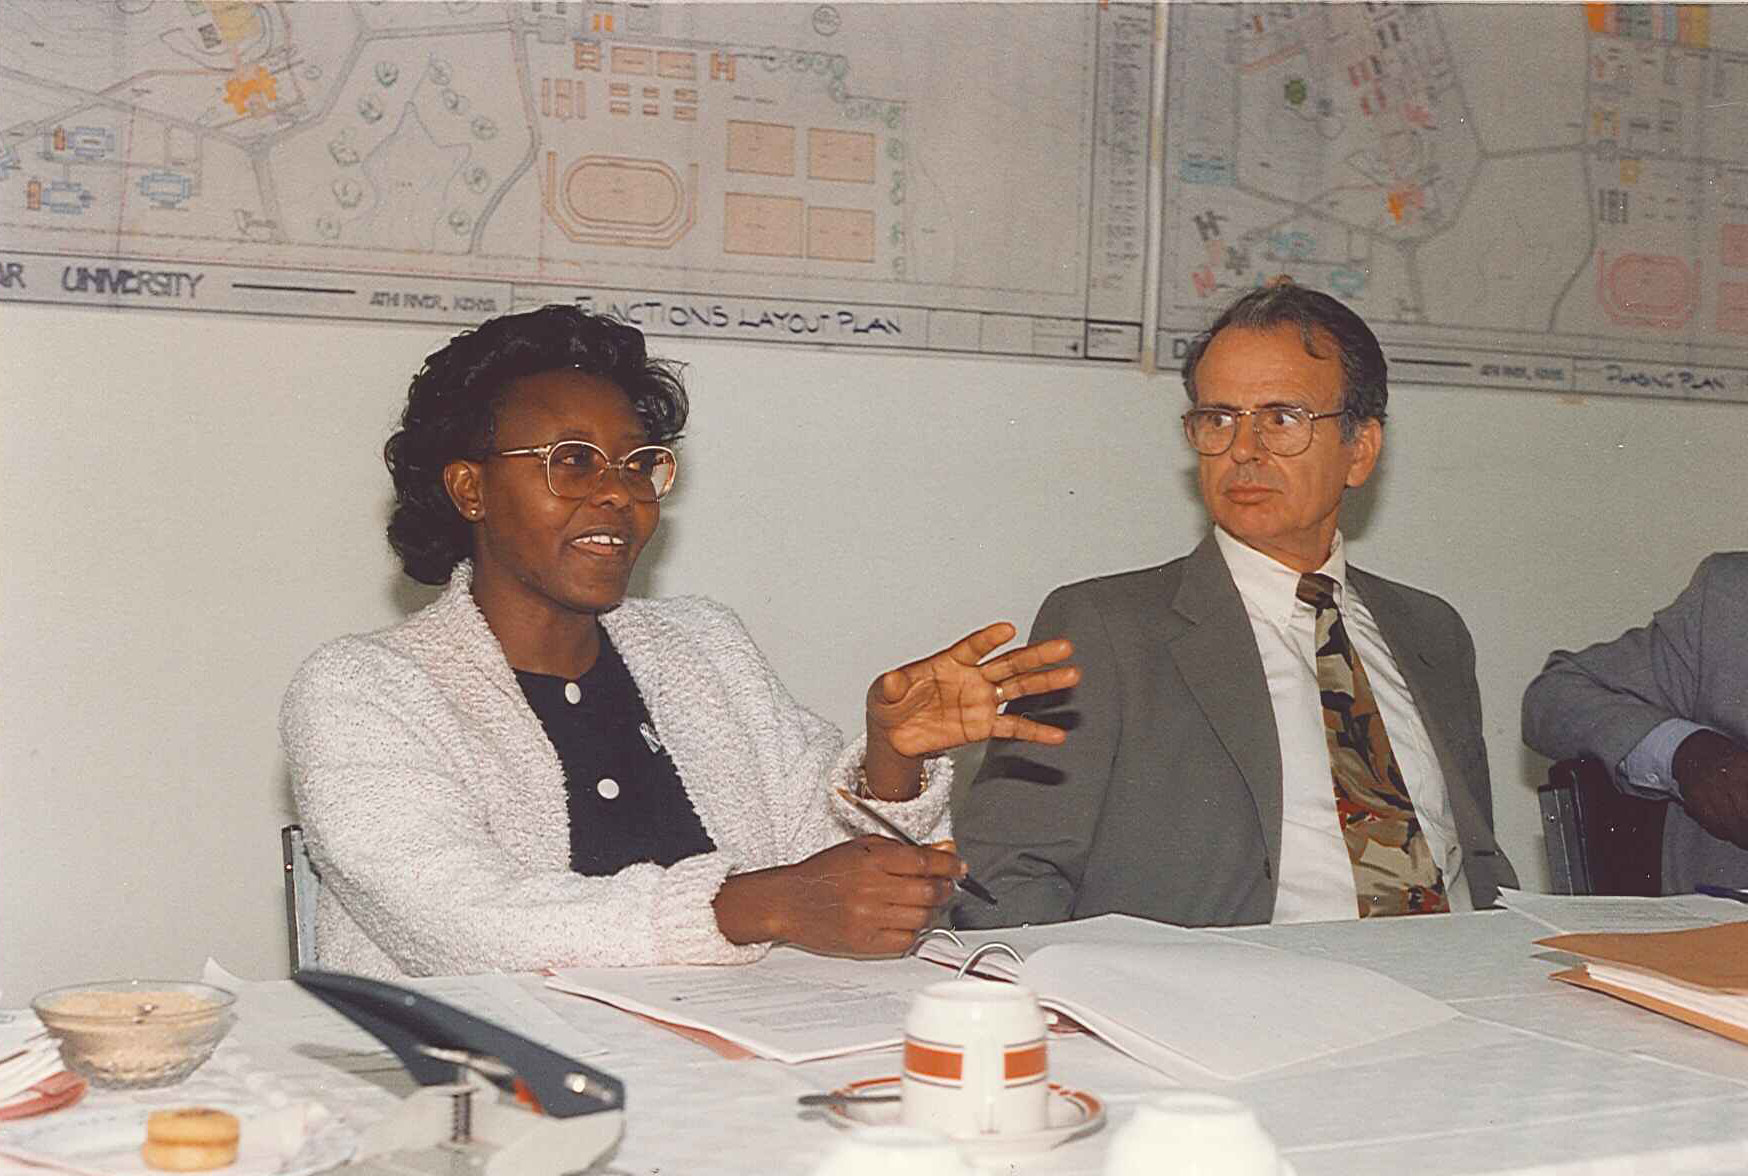 Daystar University Board Meeting 1993